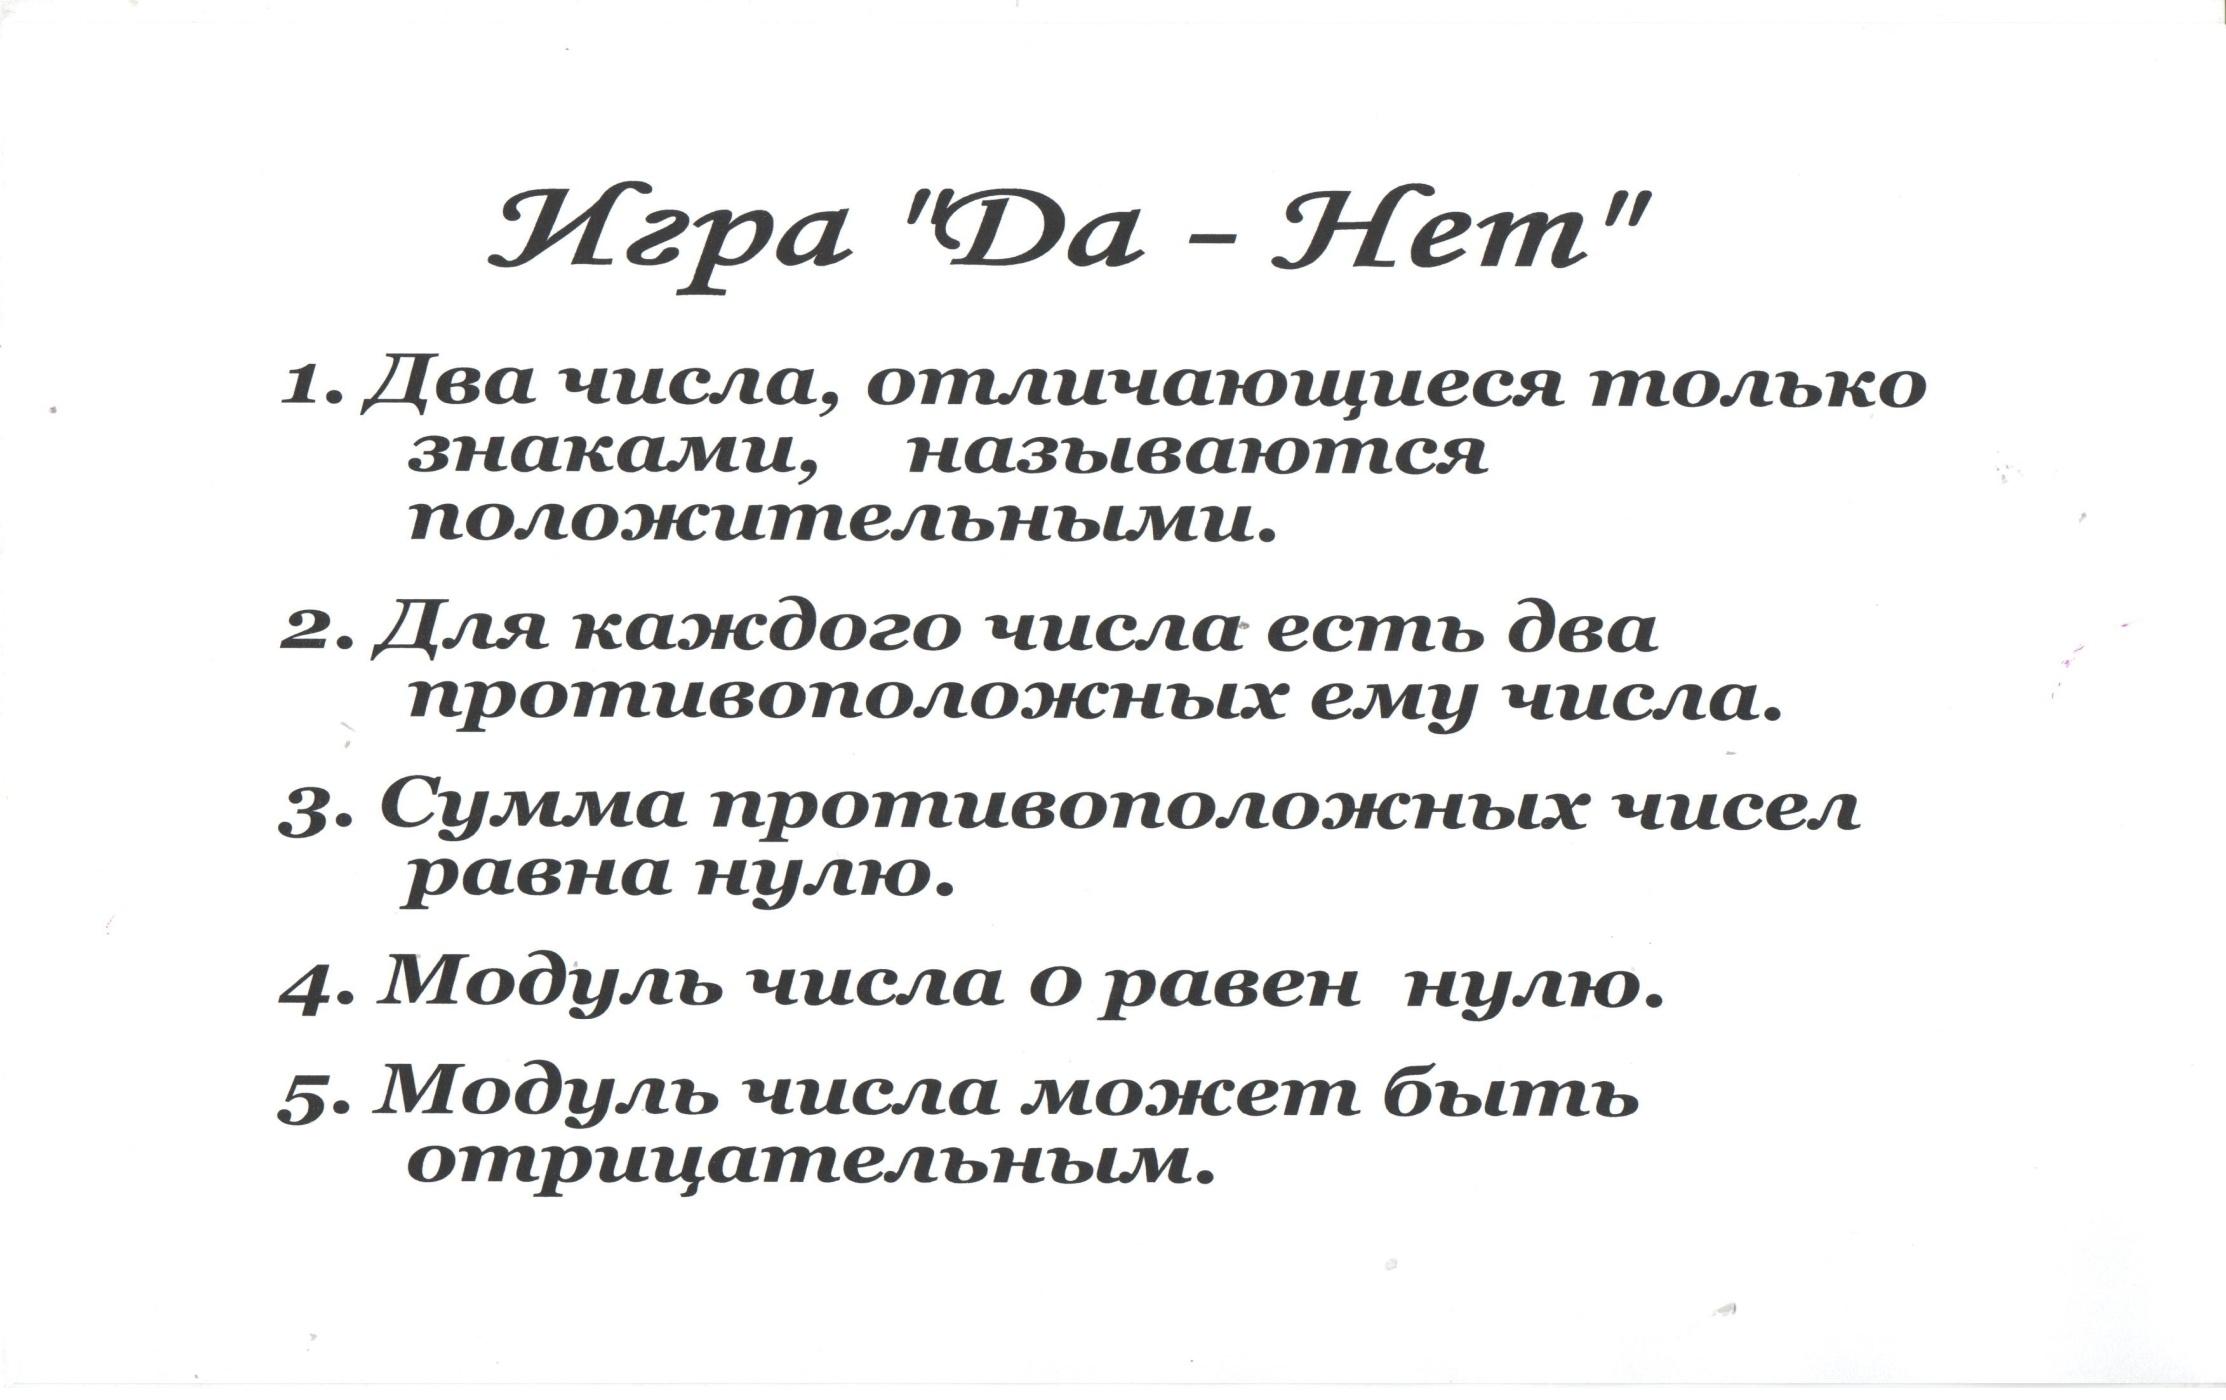 C:\Documents and Settings\Школа\Мои документы\Мои рисунки\Изображение\Изображение 037.jpg